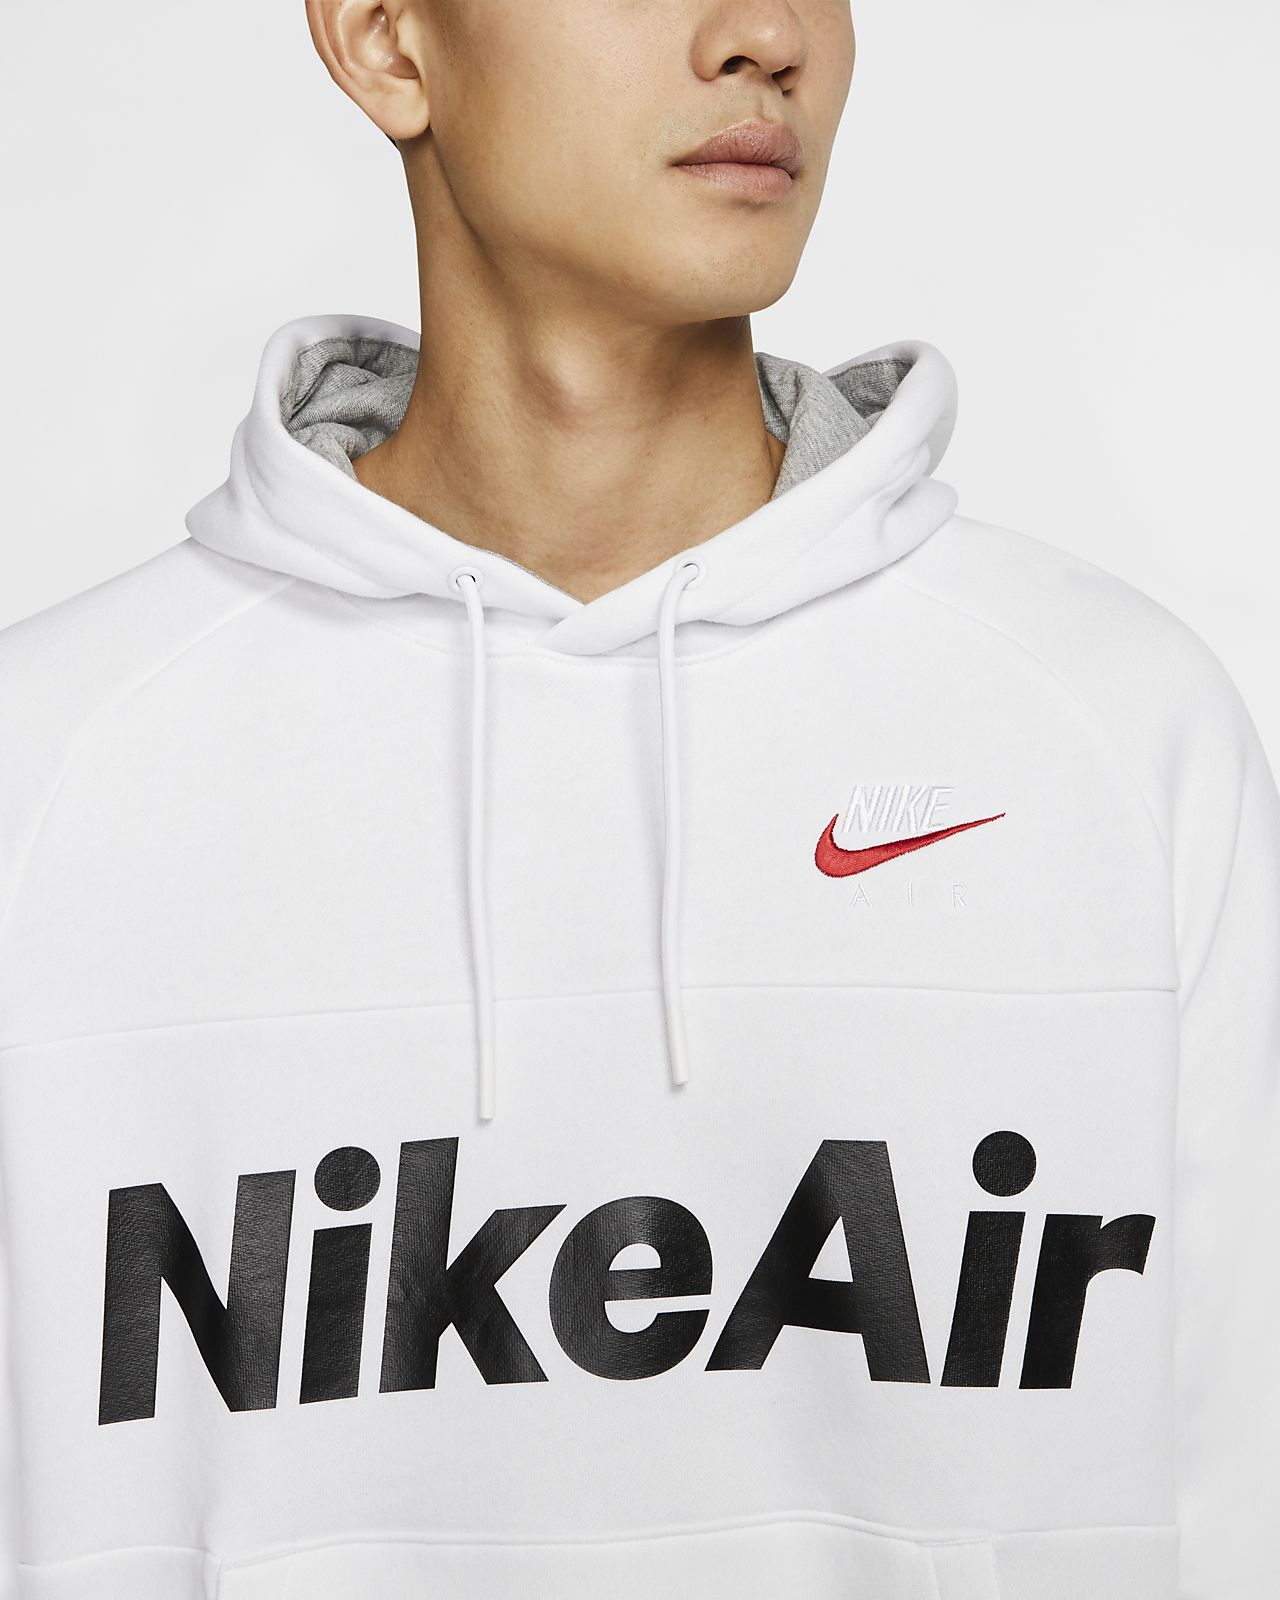 Felpa pullover in fleece con cappuccio Nike Air Uomo